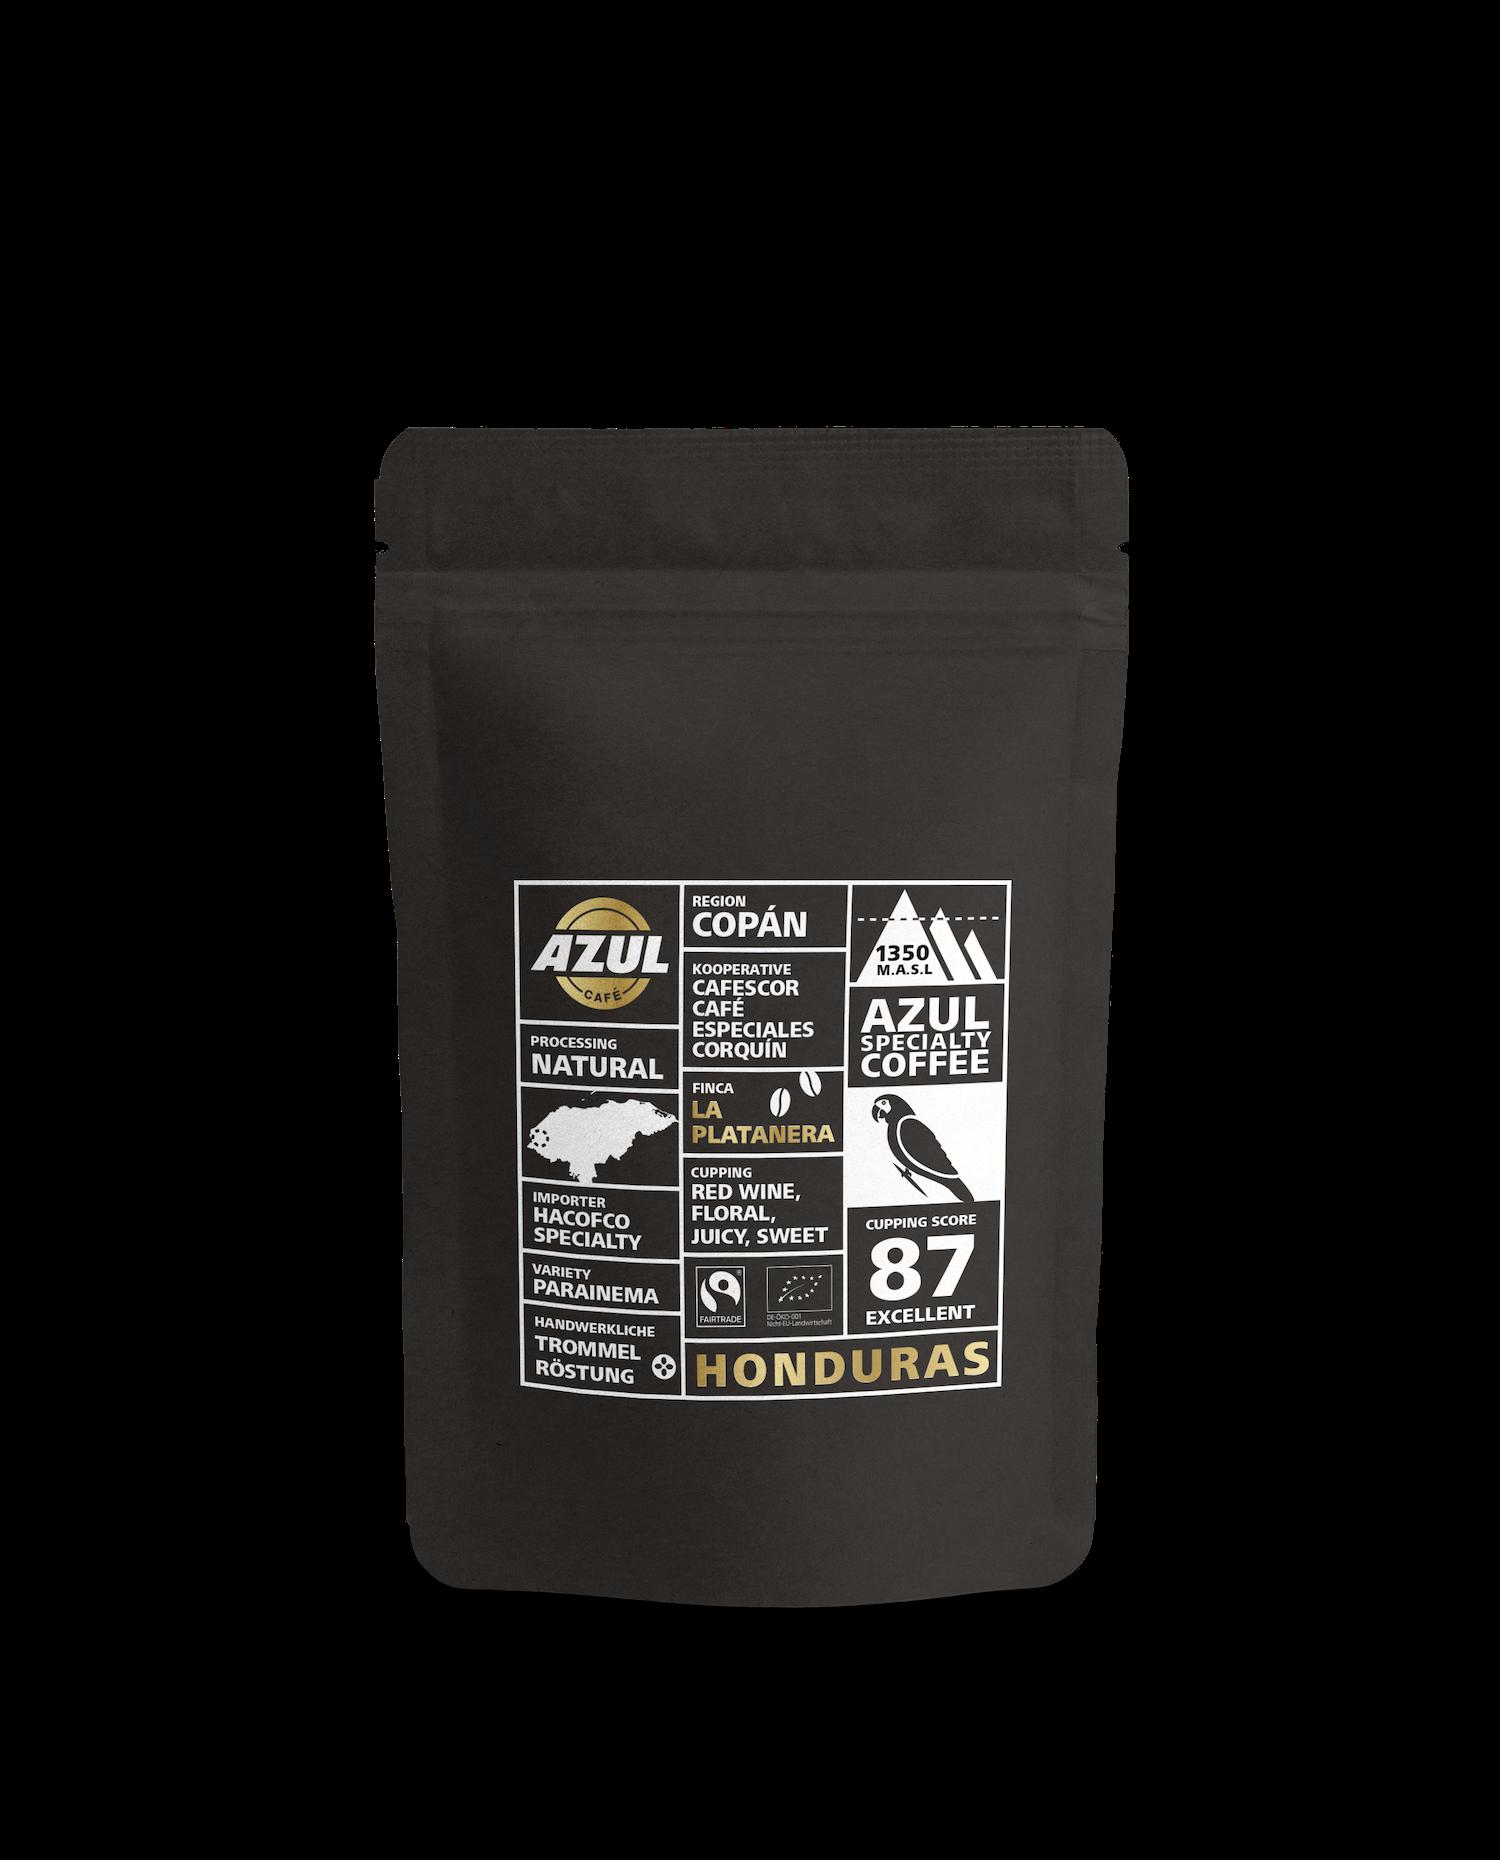 Azul Kaffee – Specialty Coffee Honduras la Platanera